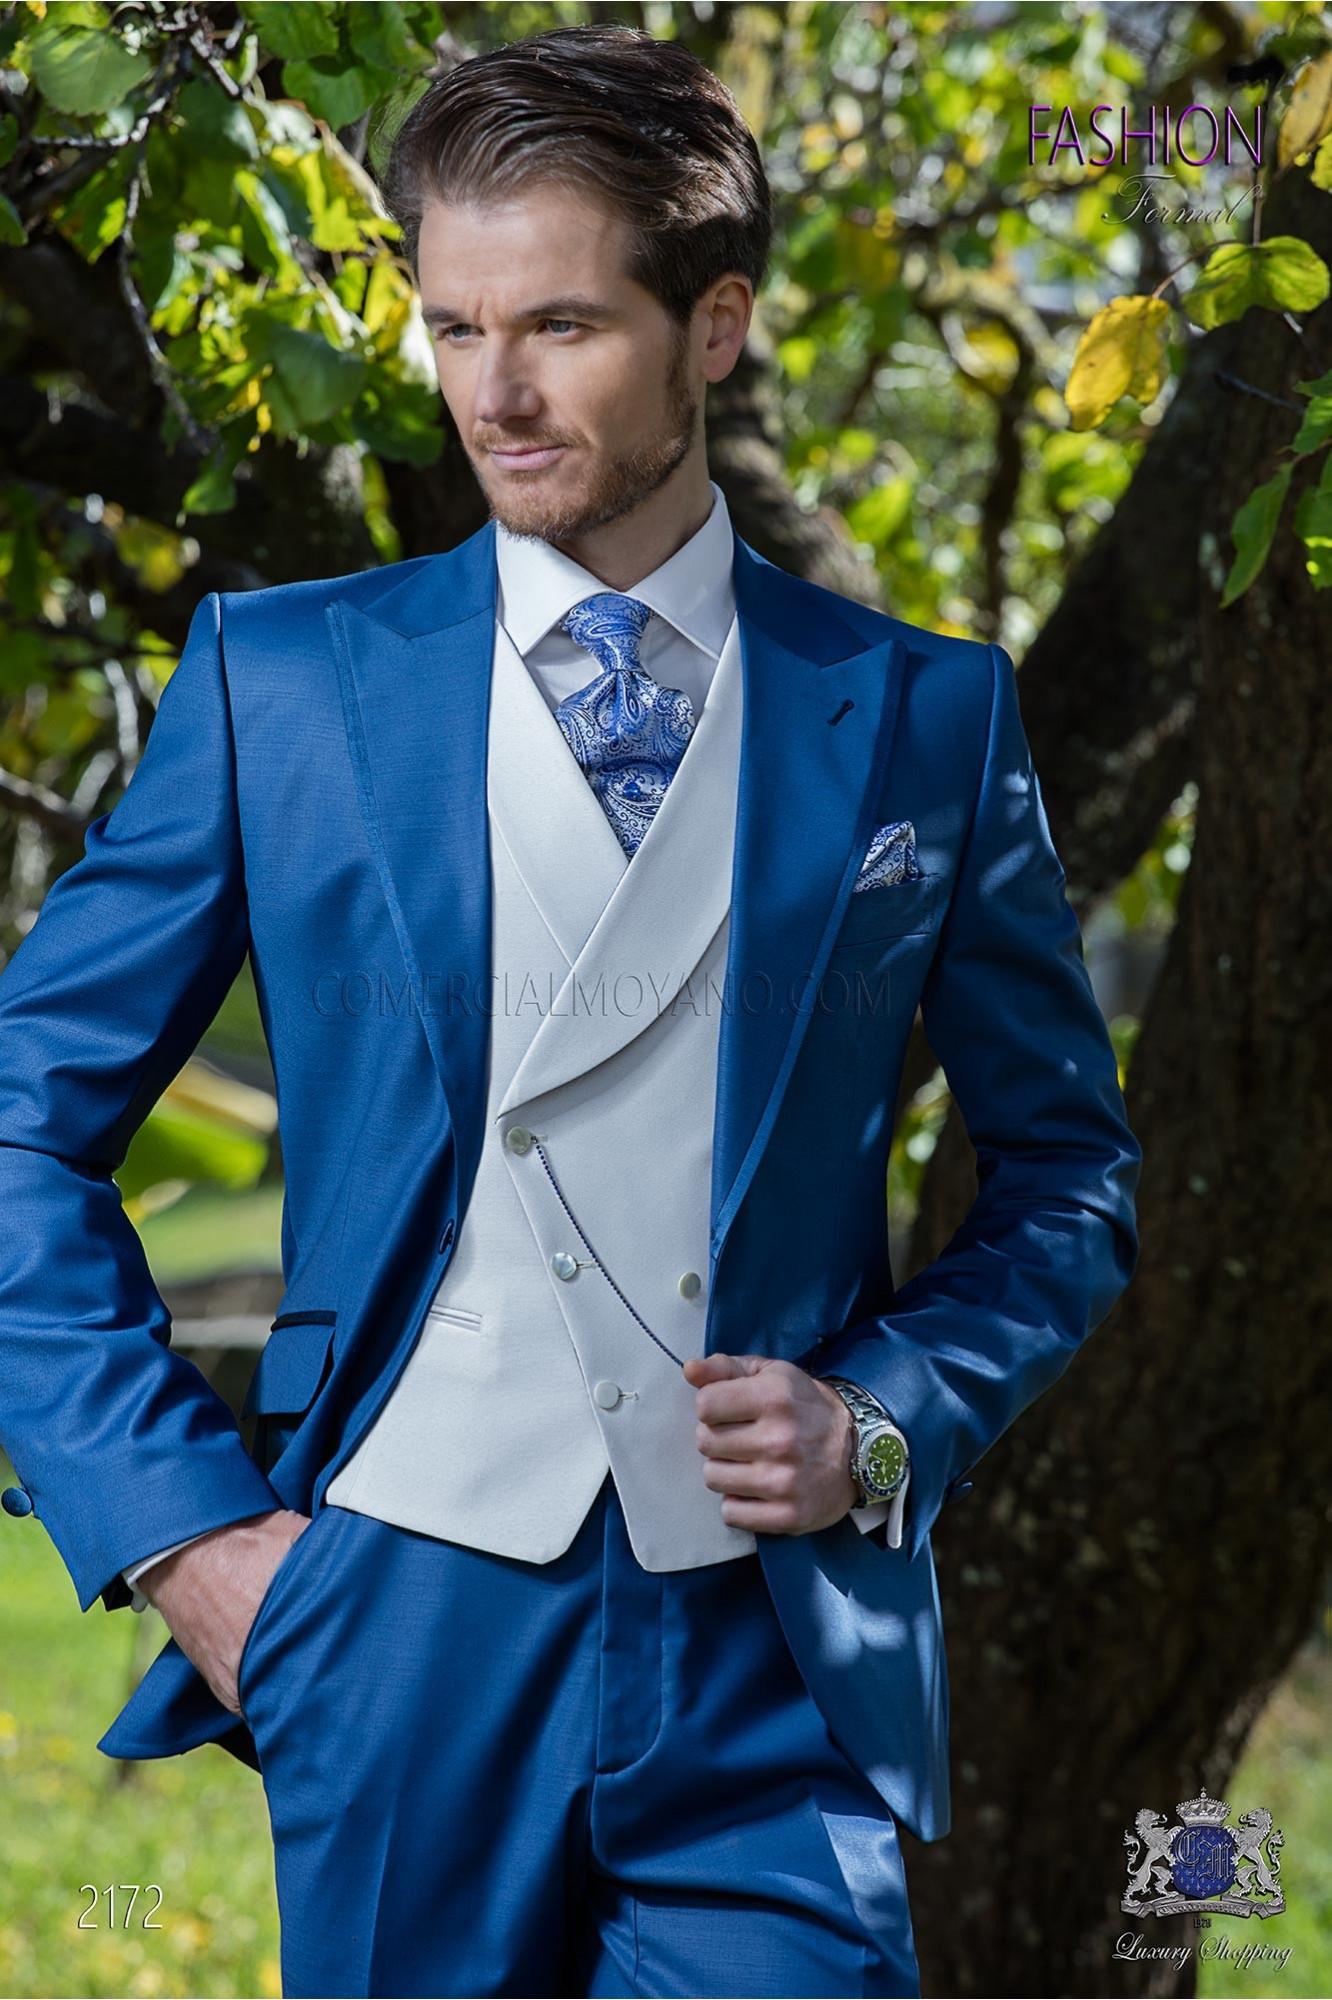 italienisch royal blaue anzug ottavio nuccio gala. Black Bedroom Furniture Sets. Home Design Ideas